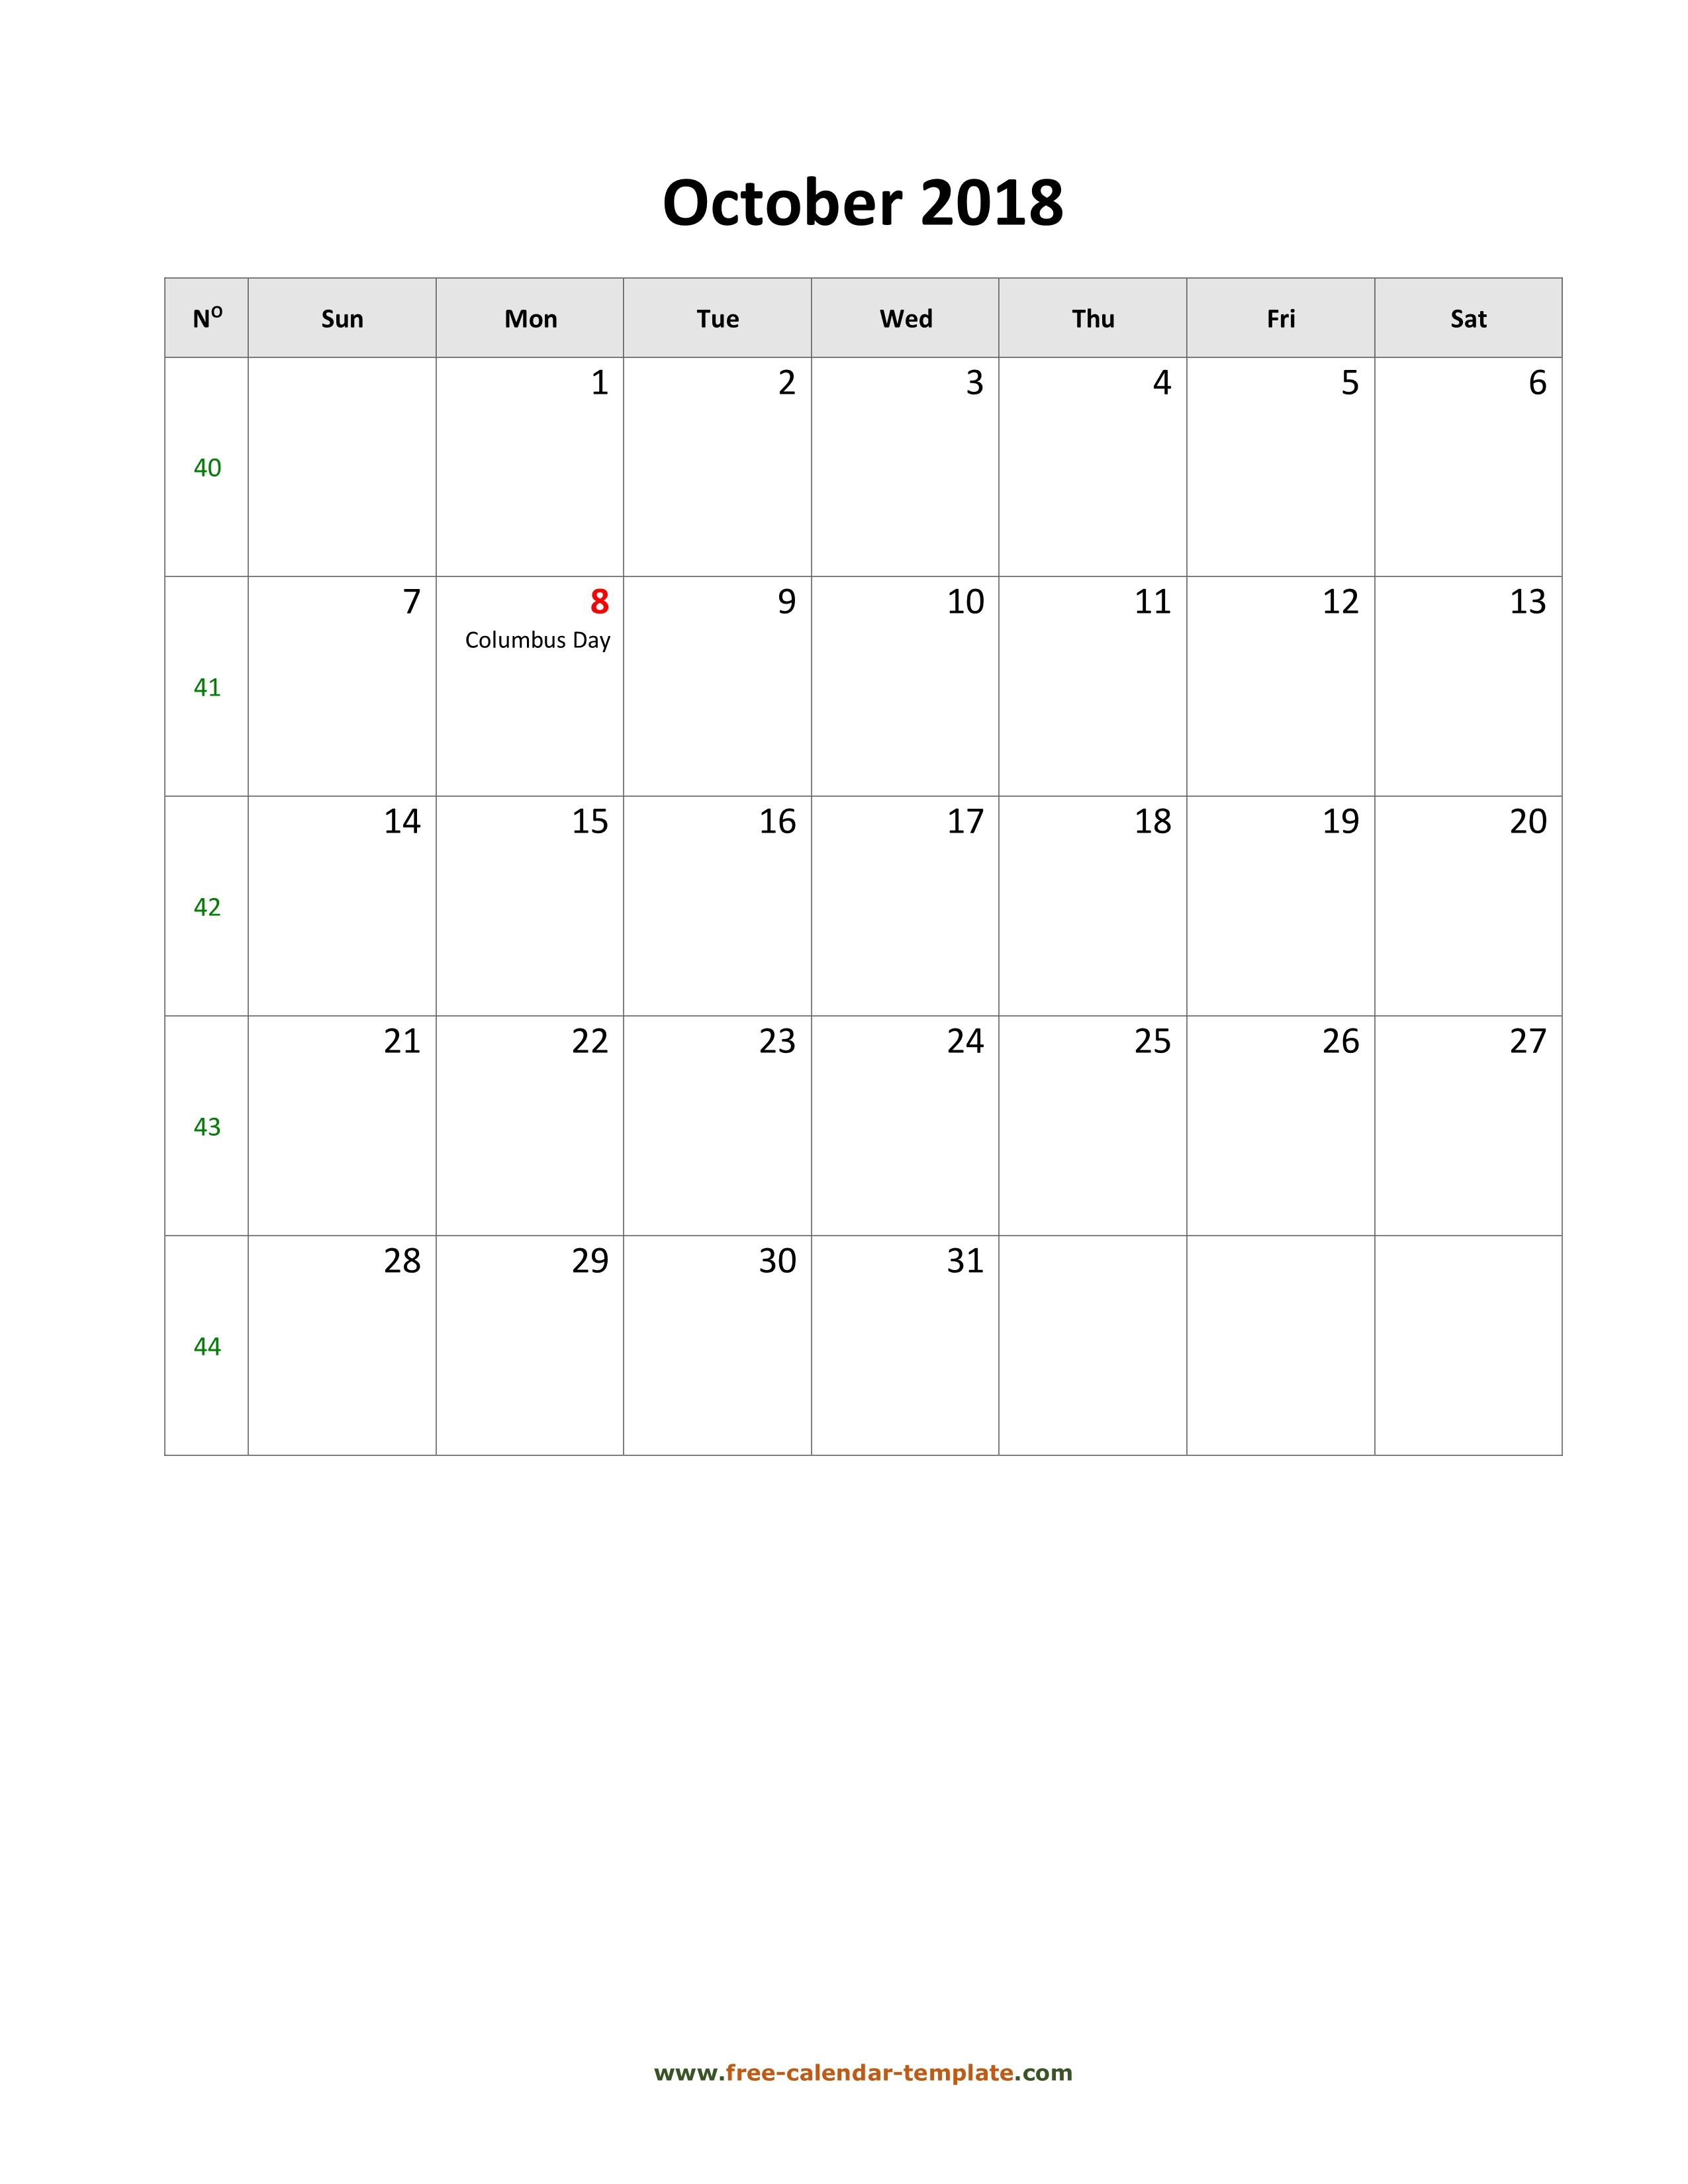 October 2018 Calendar Vertical With Holidays